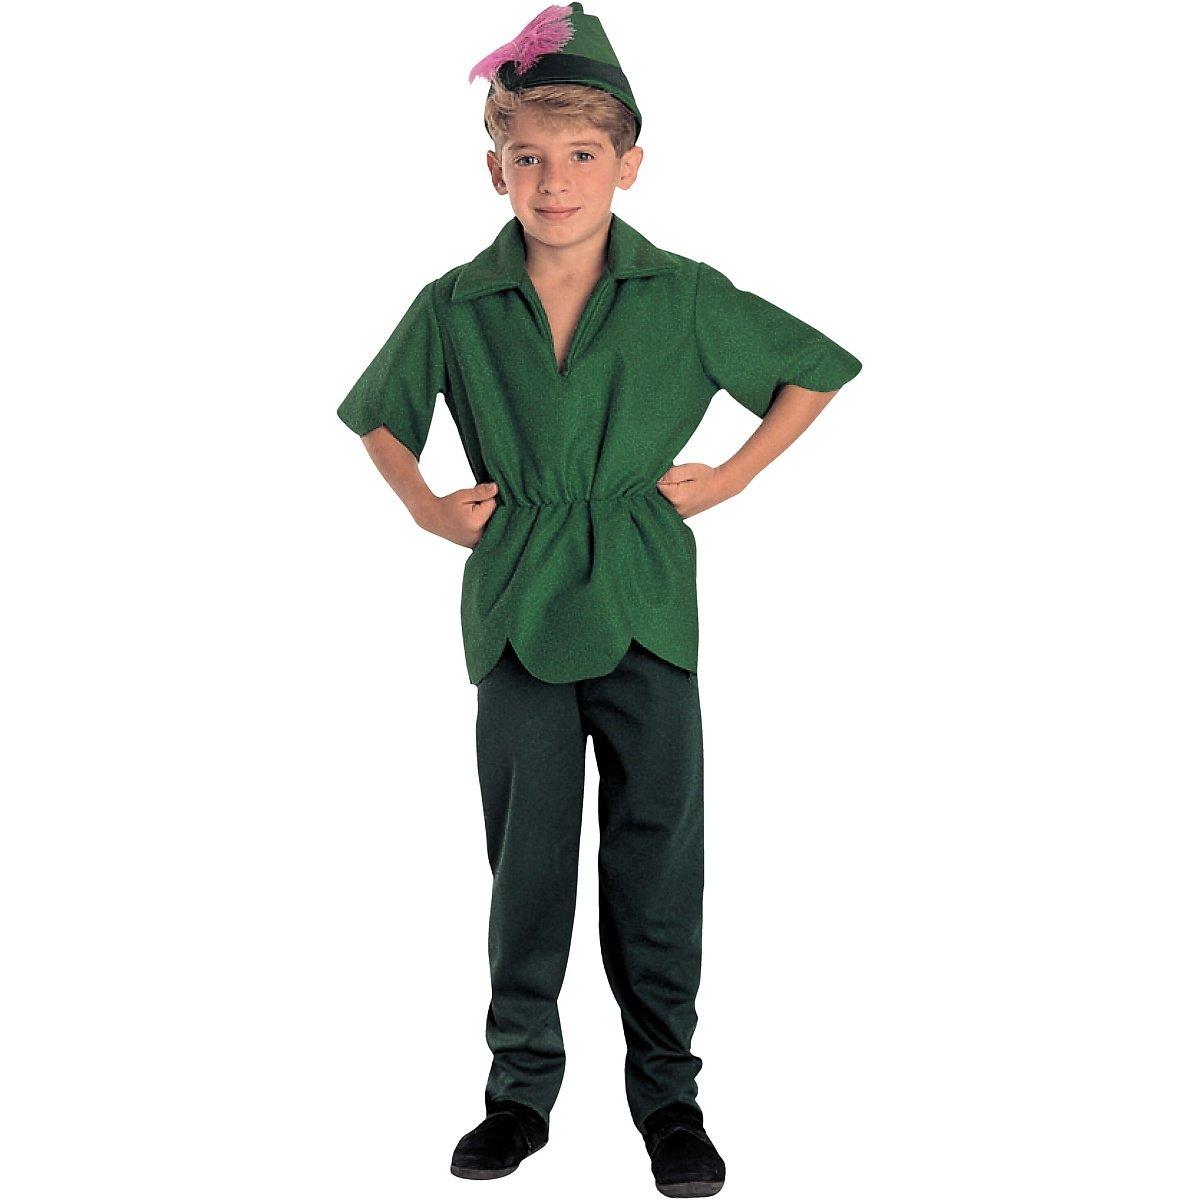 f0bec3c7 Amazon.com: Peter Pan Costume - Small: Toys & Games